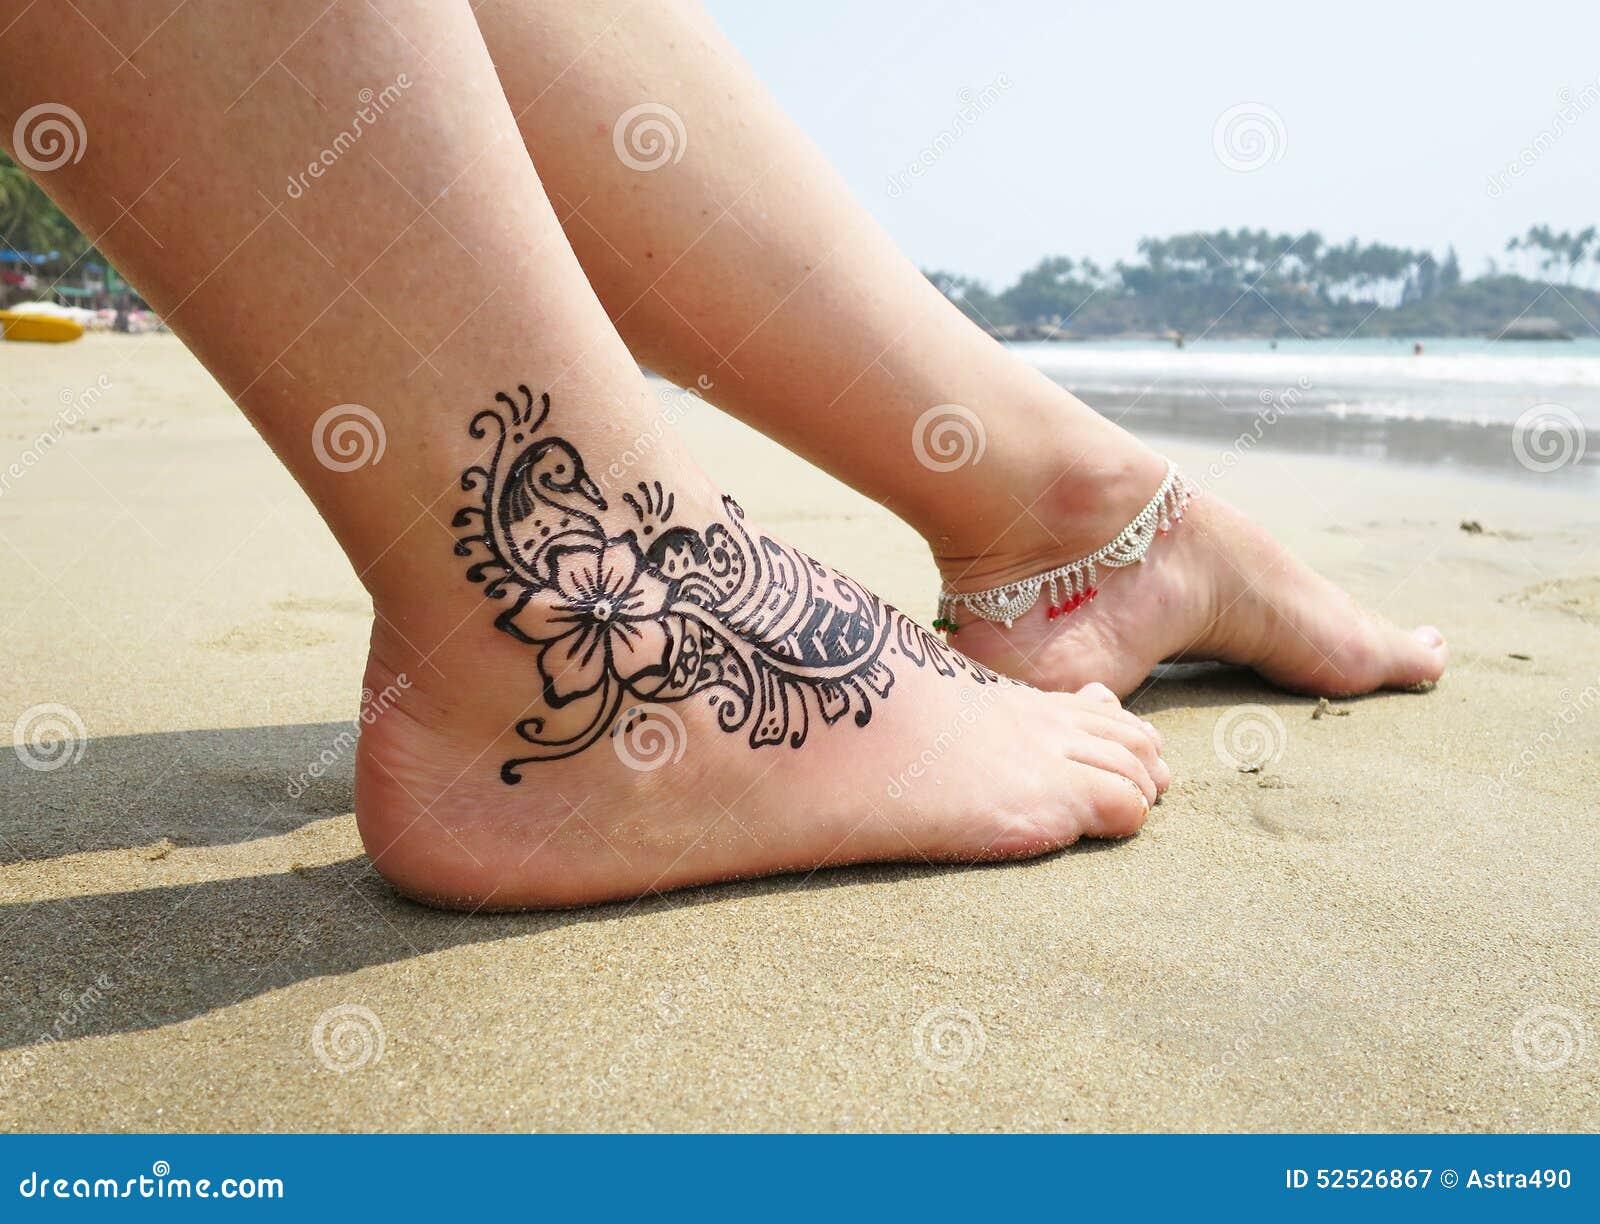 Henna Tattoo Beach: Henna Tattoo On The Foot Stock Image. Image Of Henna